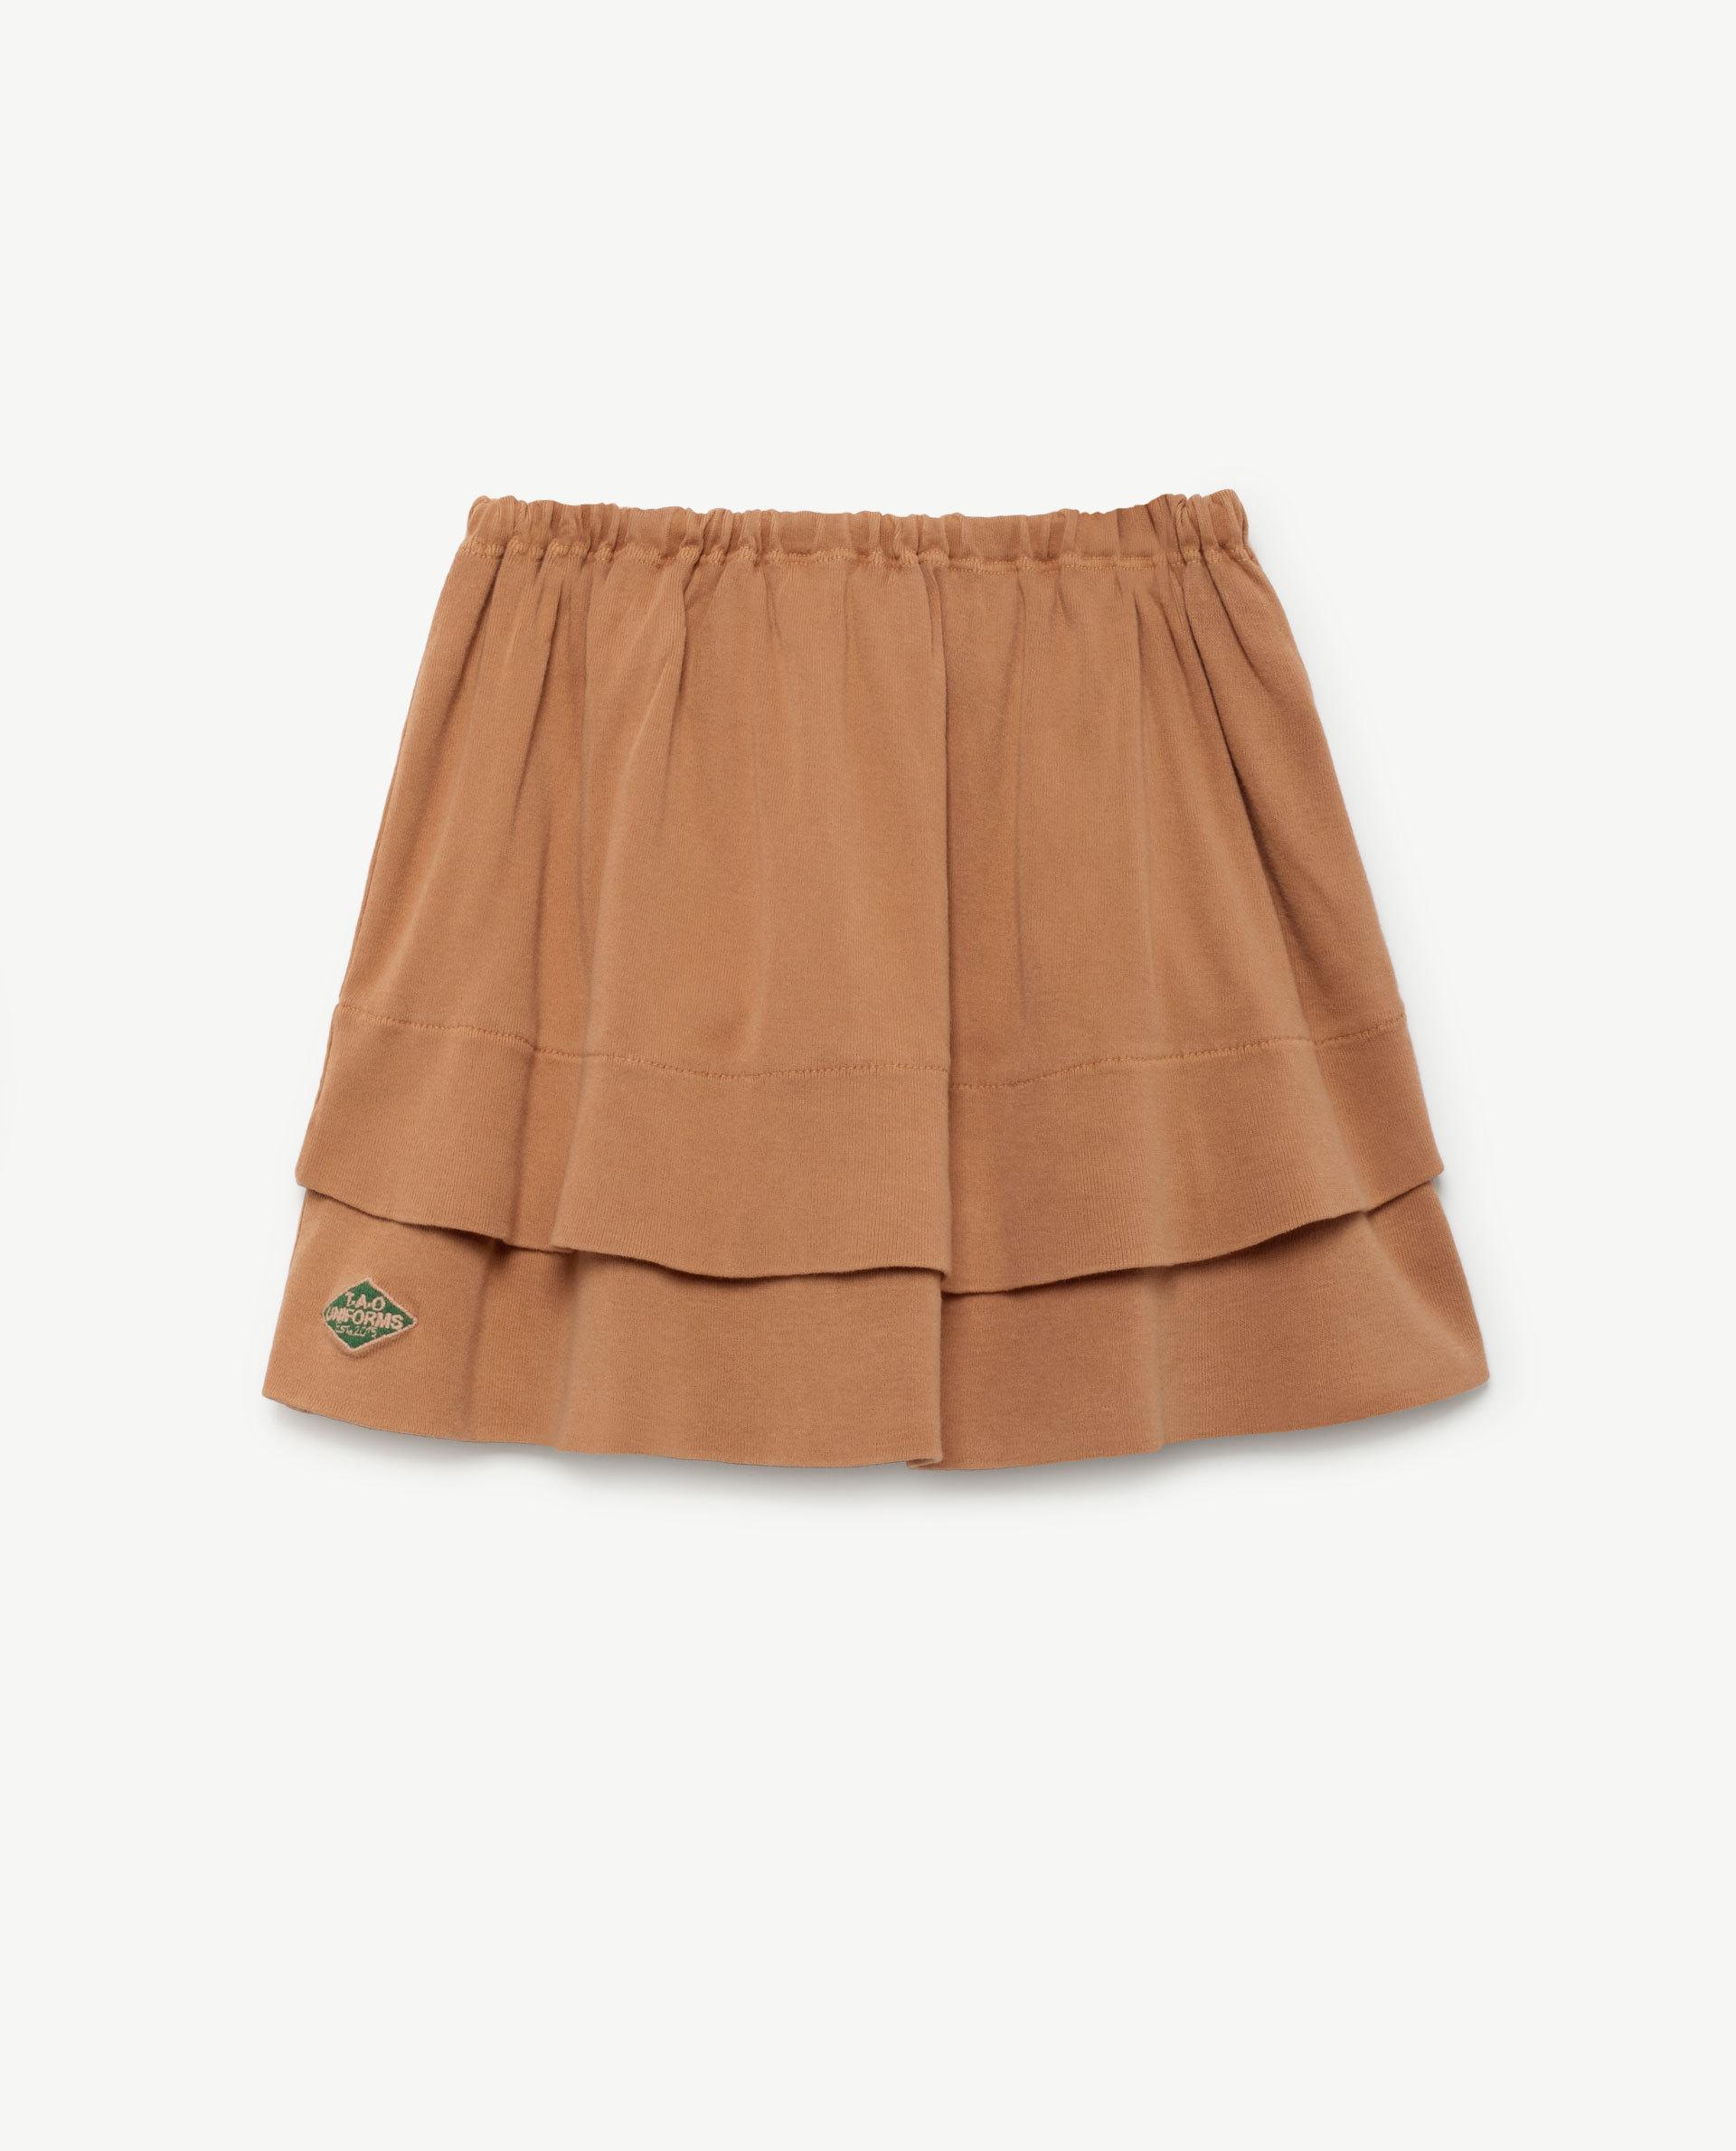 T.A.O.(THE ANIMALS OBSERVATORY) Seamstress kids skirt